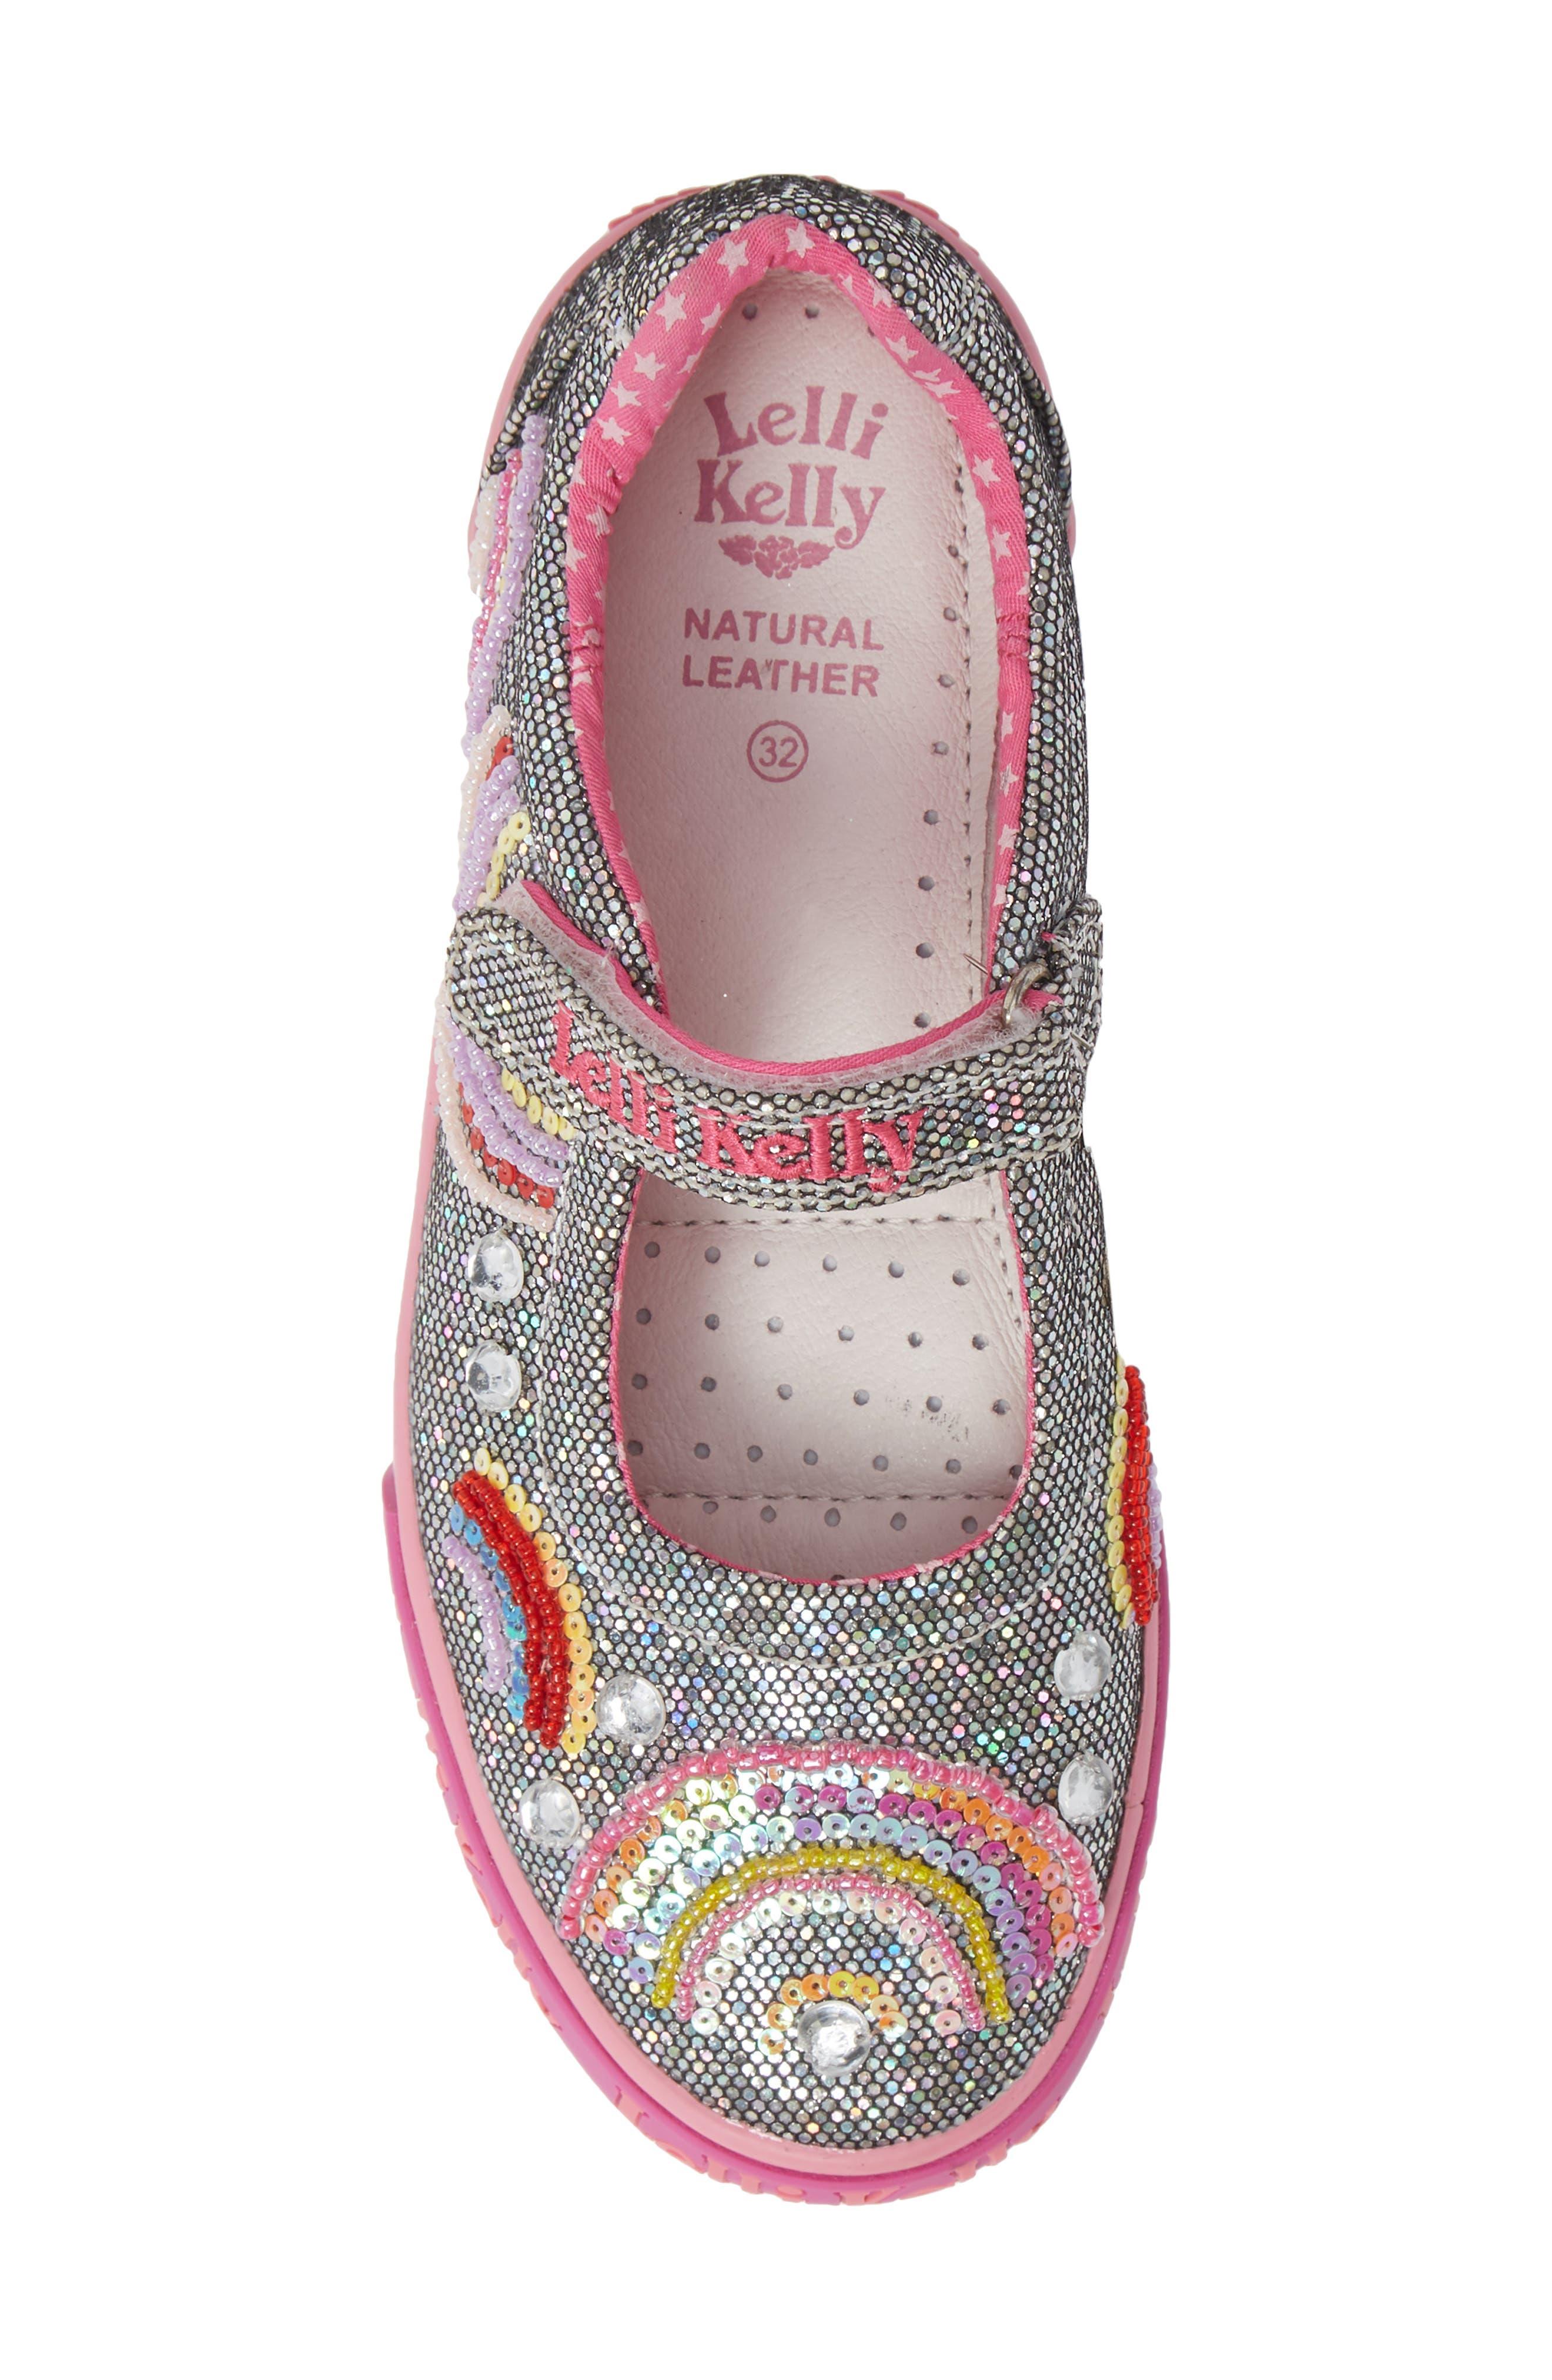 LELLI KELLY, Beaded Rainbow Mary Jane Sneaker, Alternate thumbnail 5, color, PEWTER